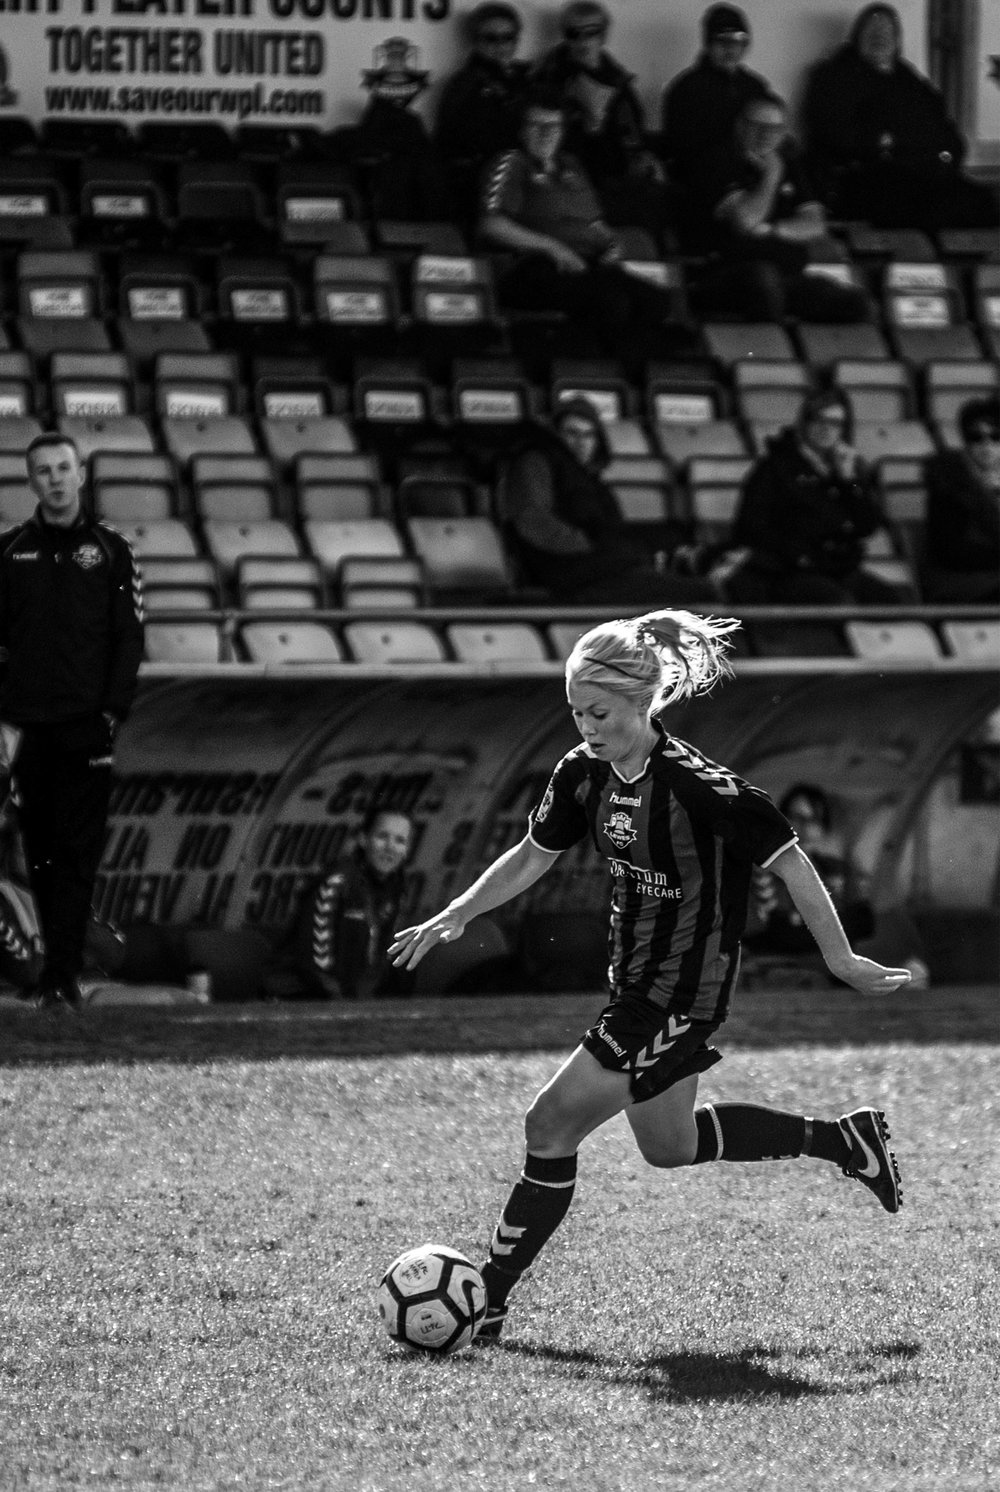 Woman footballer dribbling with ball backlit.jpg